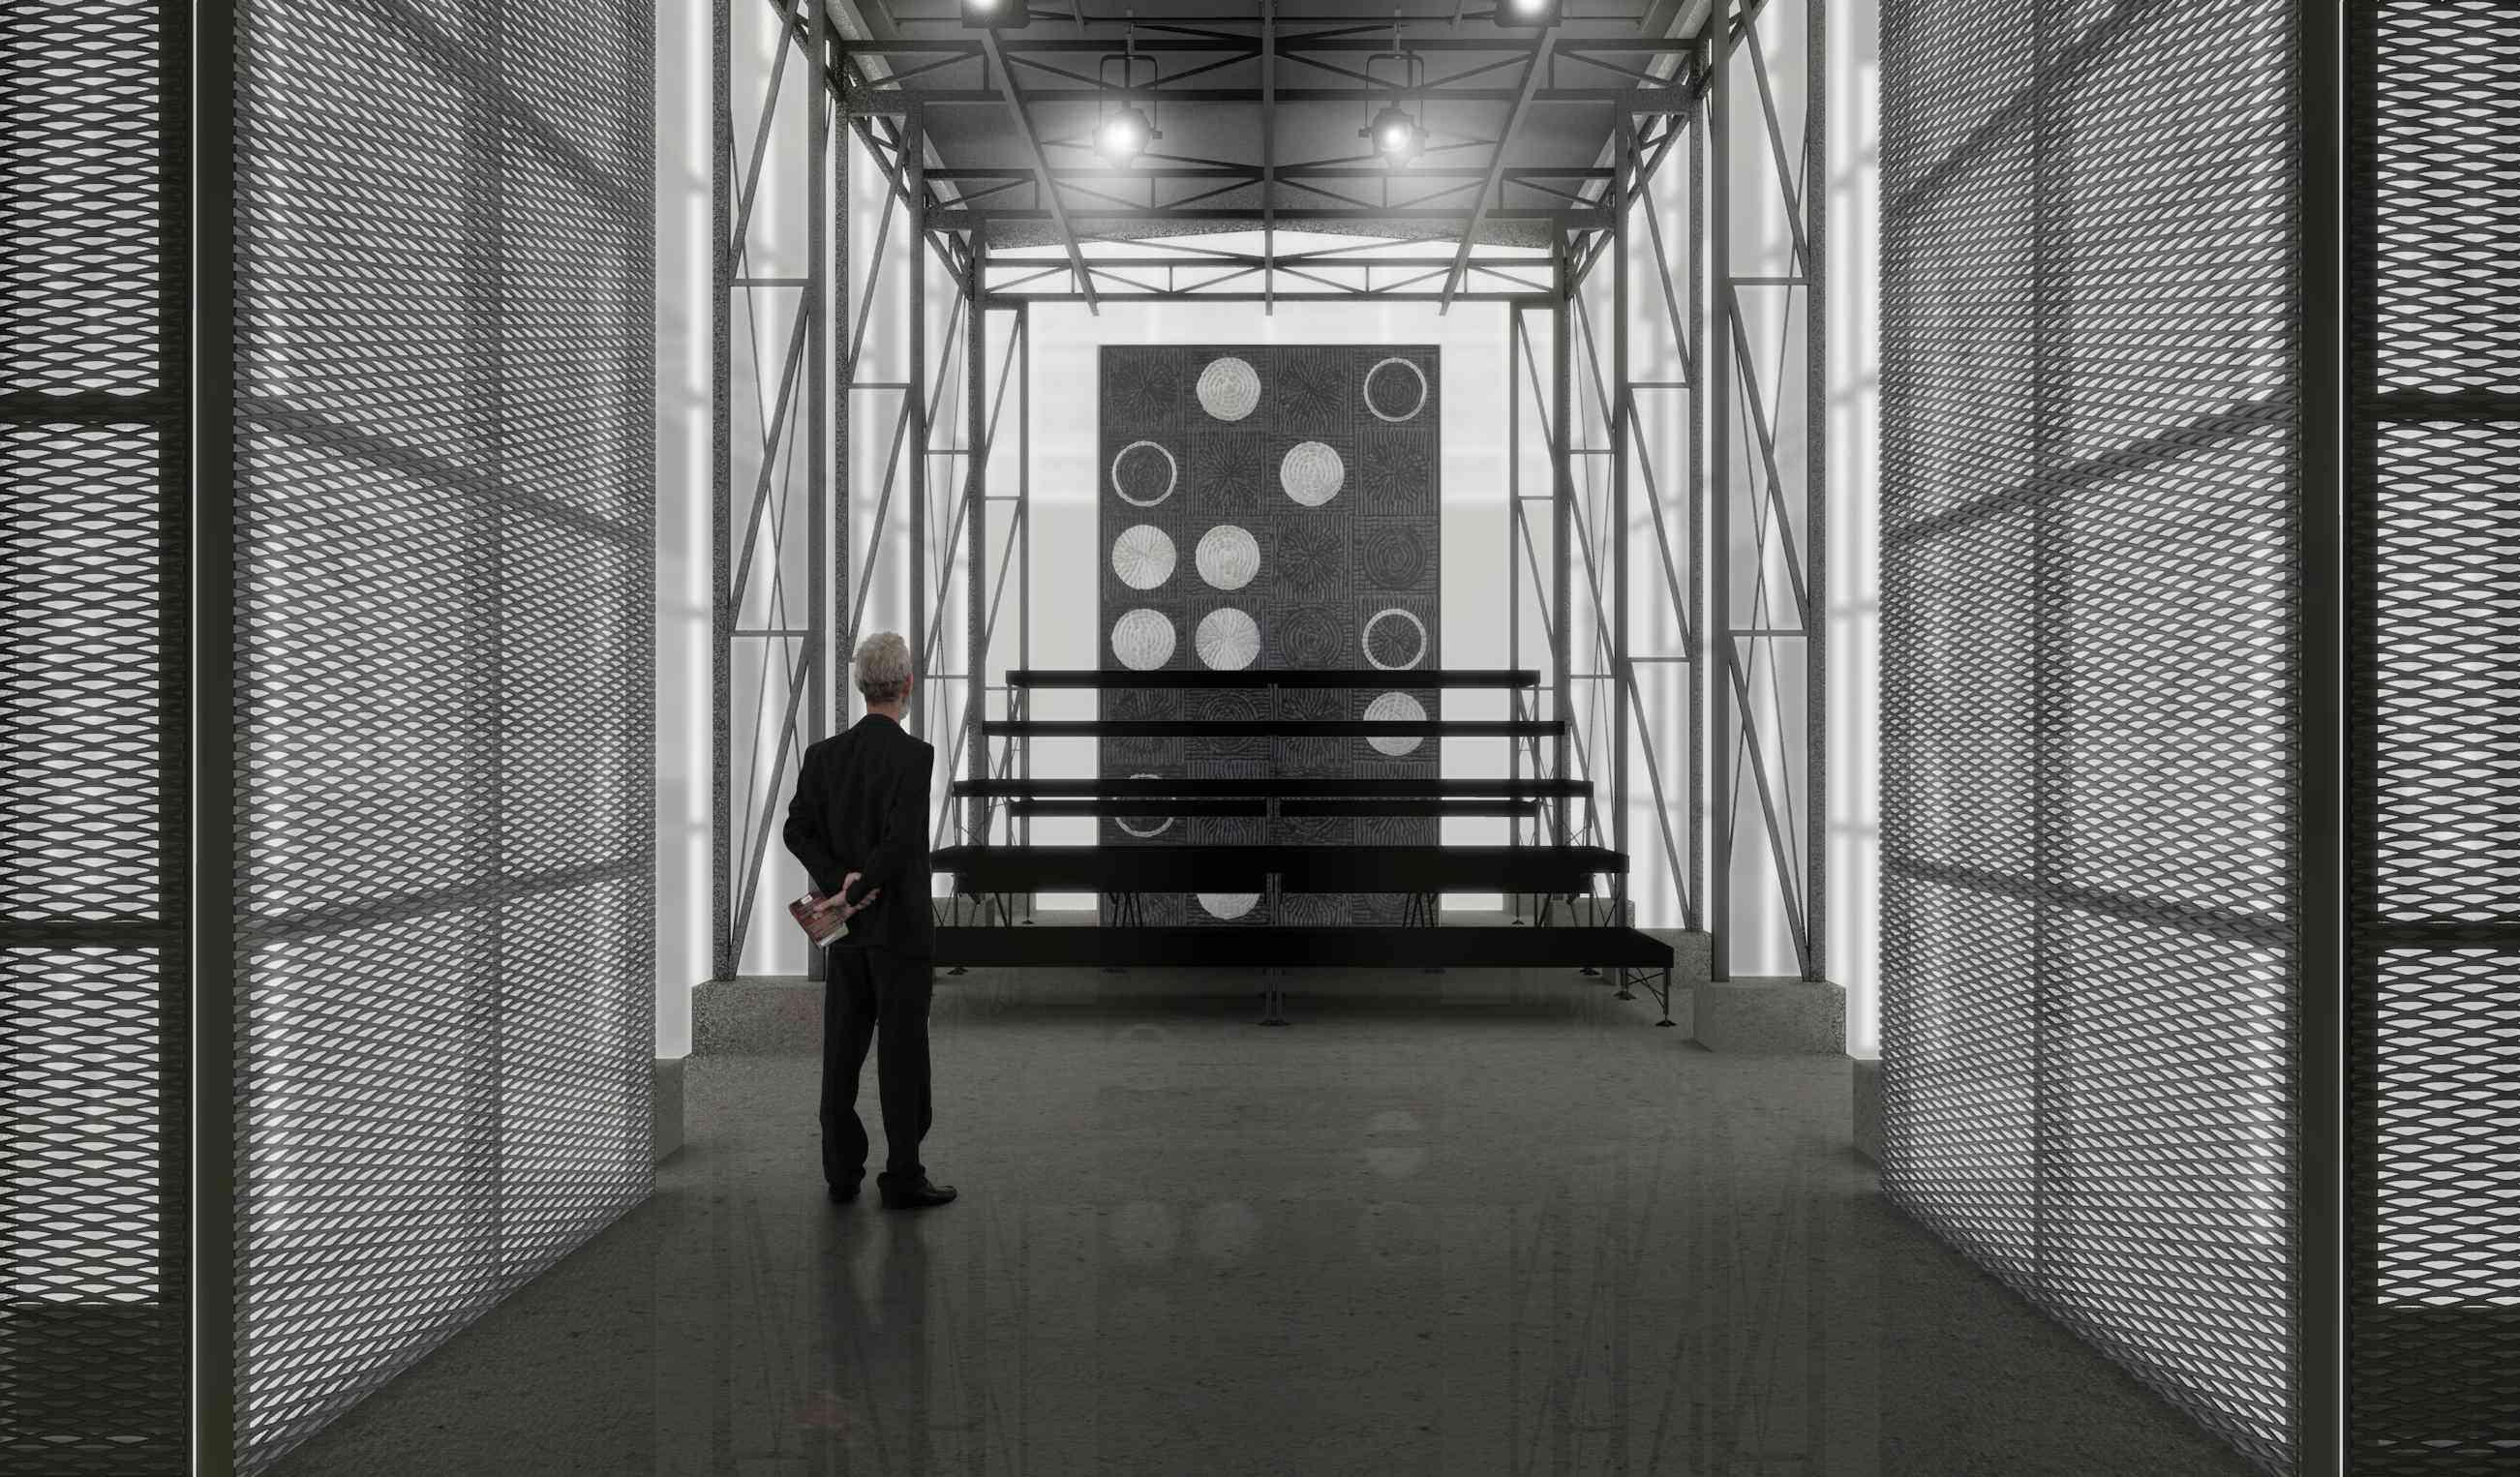 Imagem: Teatro Multiuso/Perspectiva Interna por Haiko Cirne Sinnema